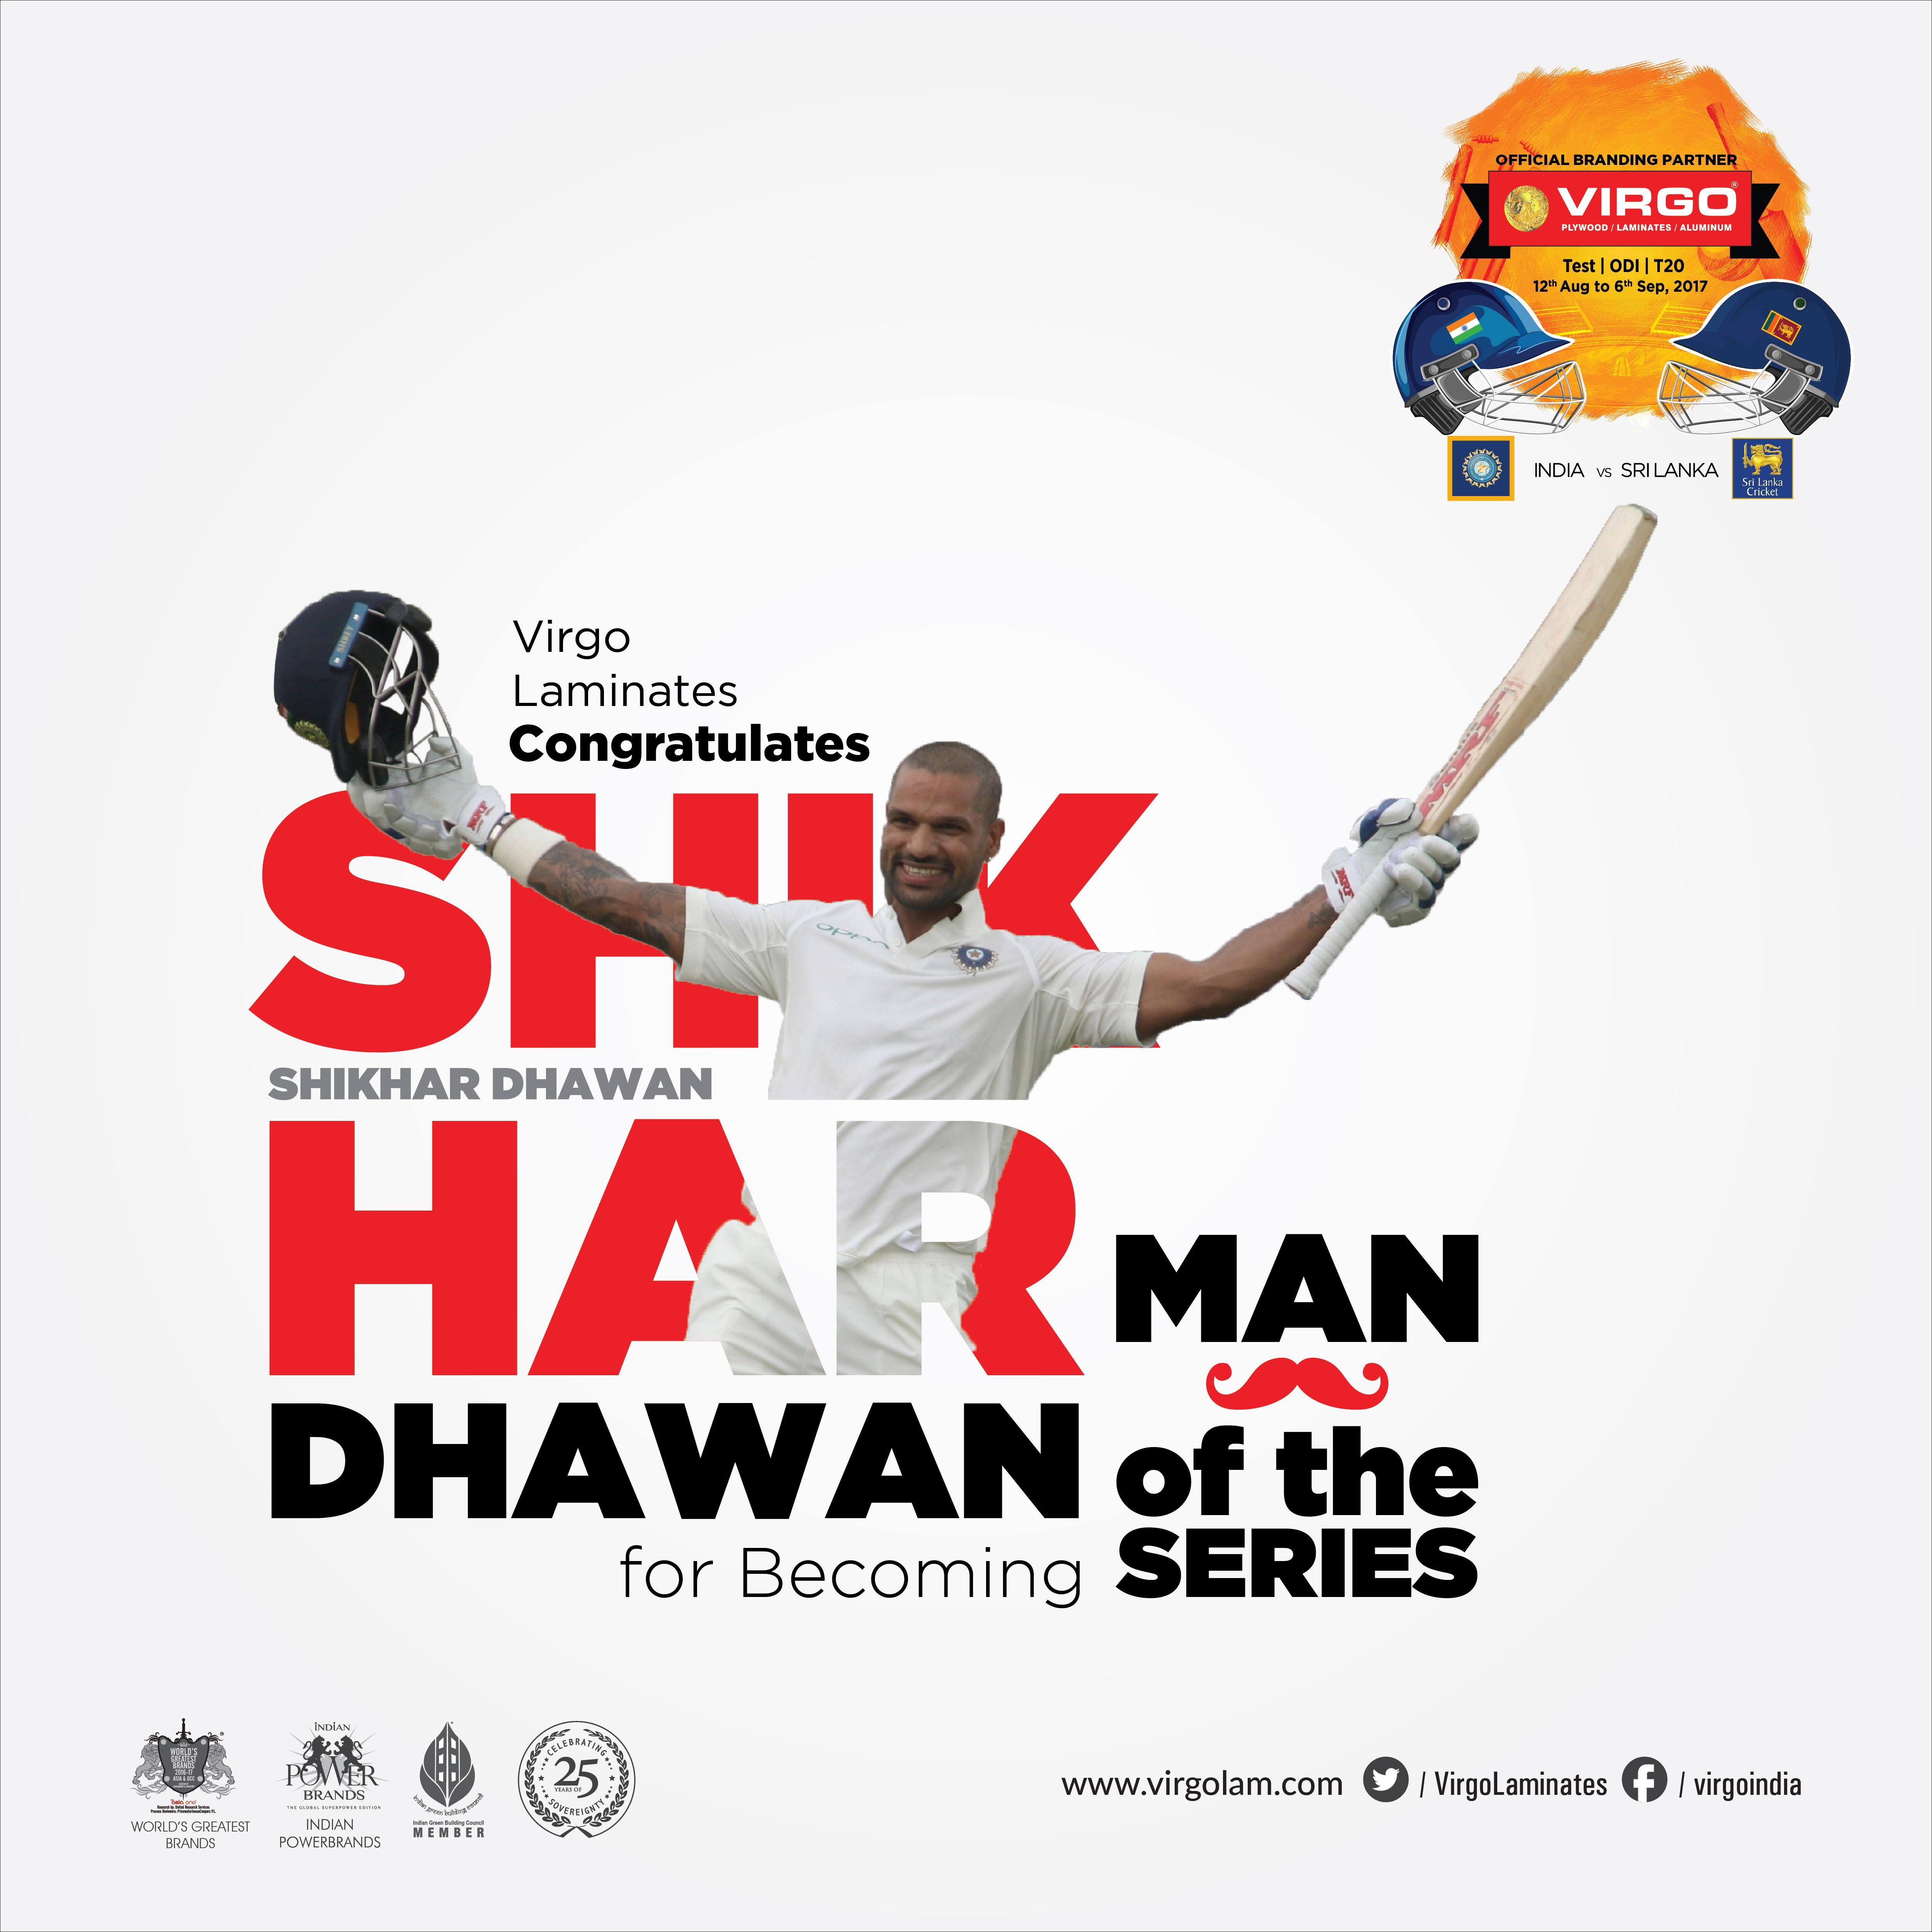 Virgo Laminates Congratulates SHIKHAR DHAWAN for